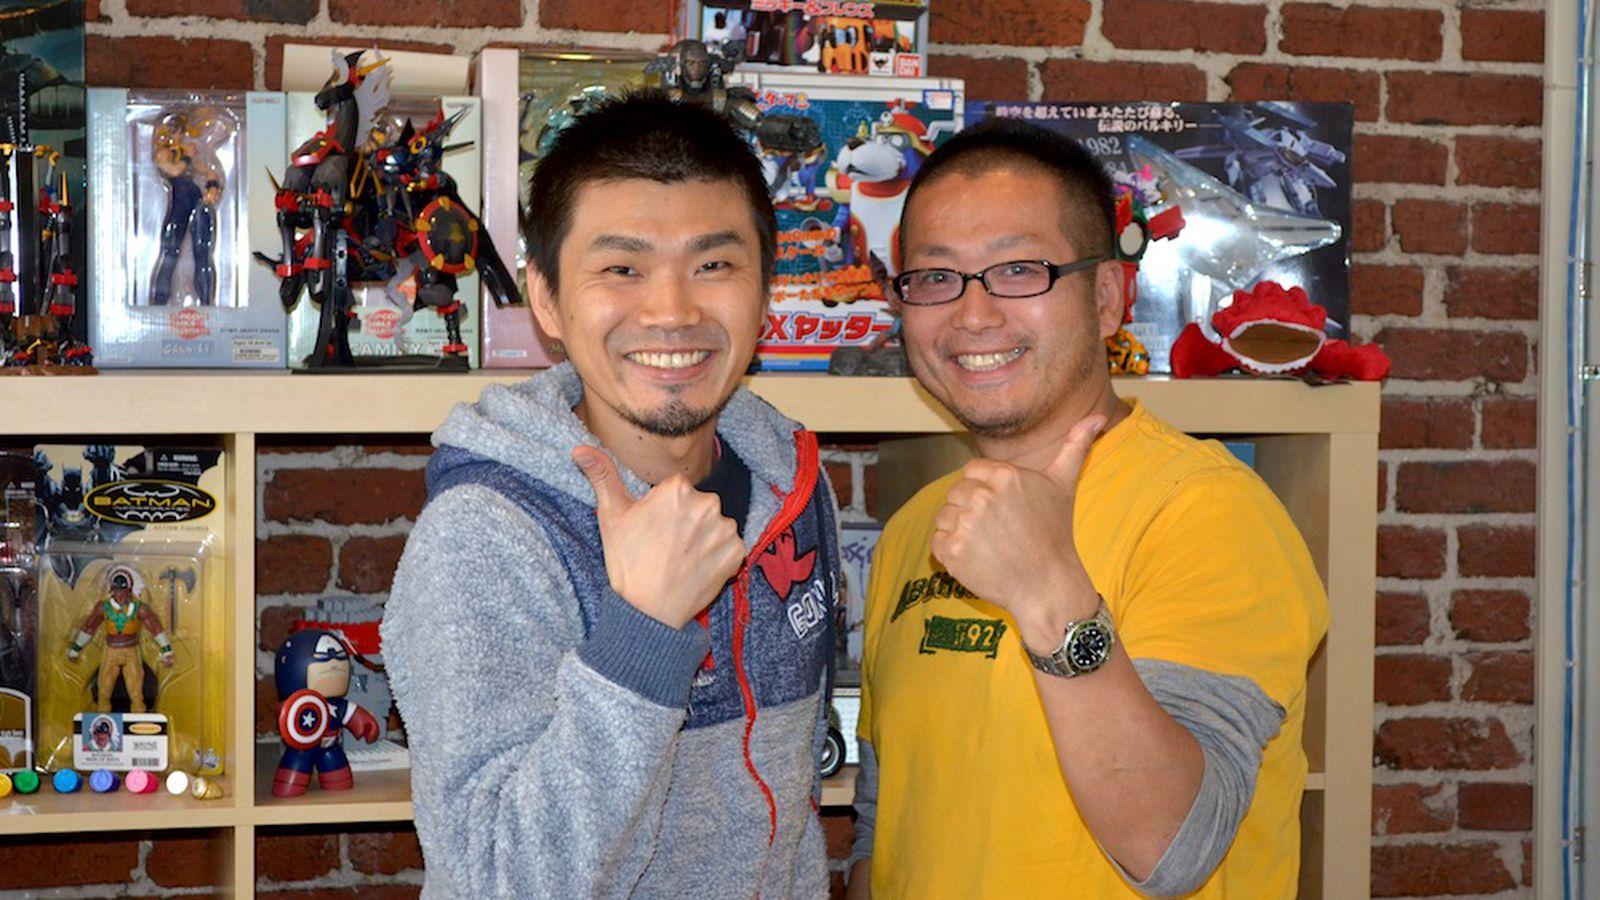 ... Strike: The redemption of Capcom legend Yoshiki Okamoto - Polygon